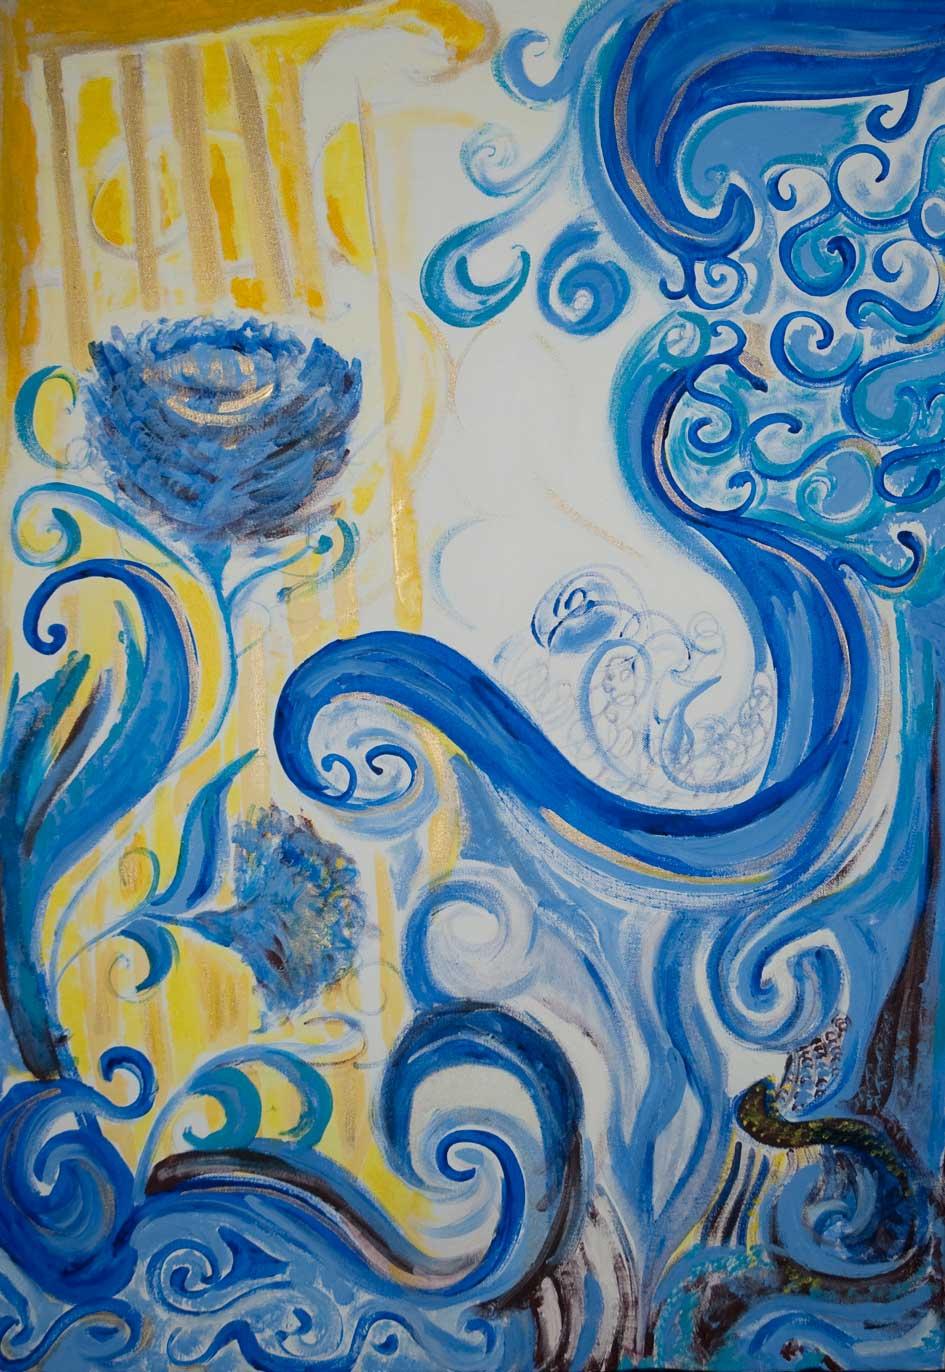 Blaue blumen maria di martino